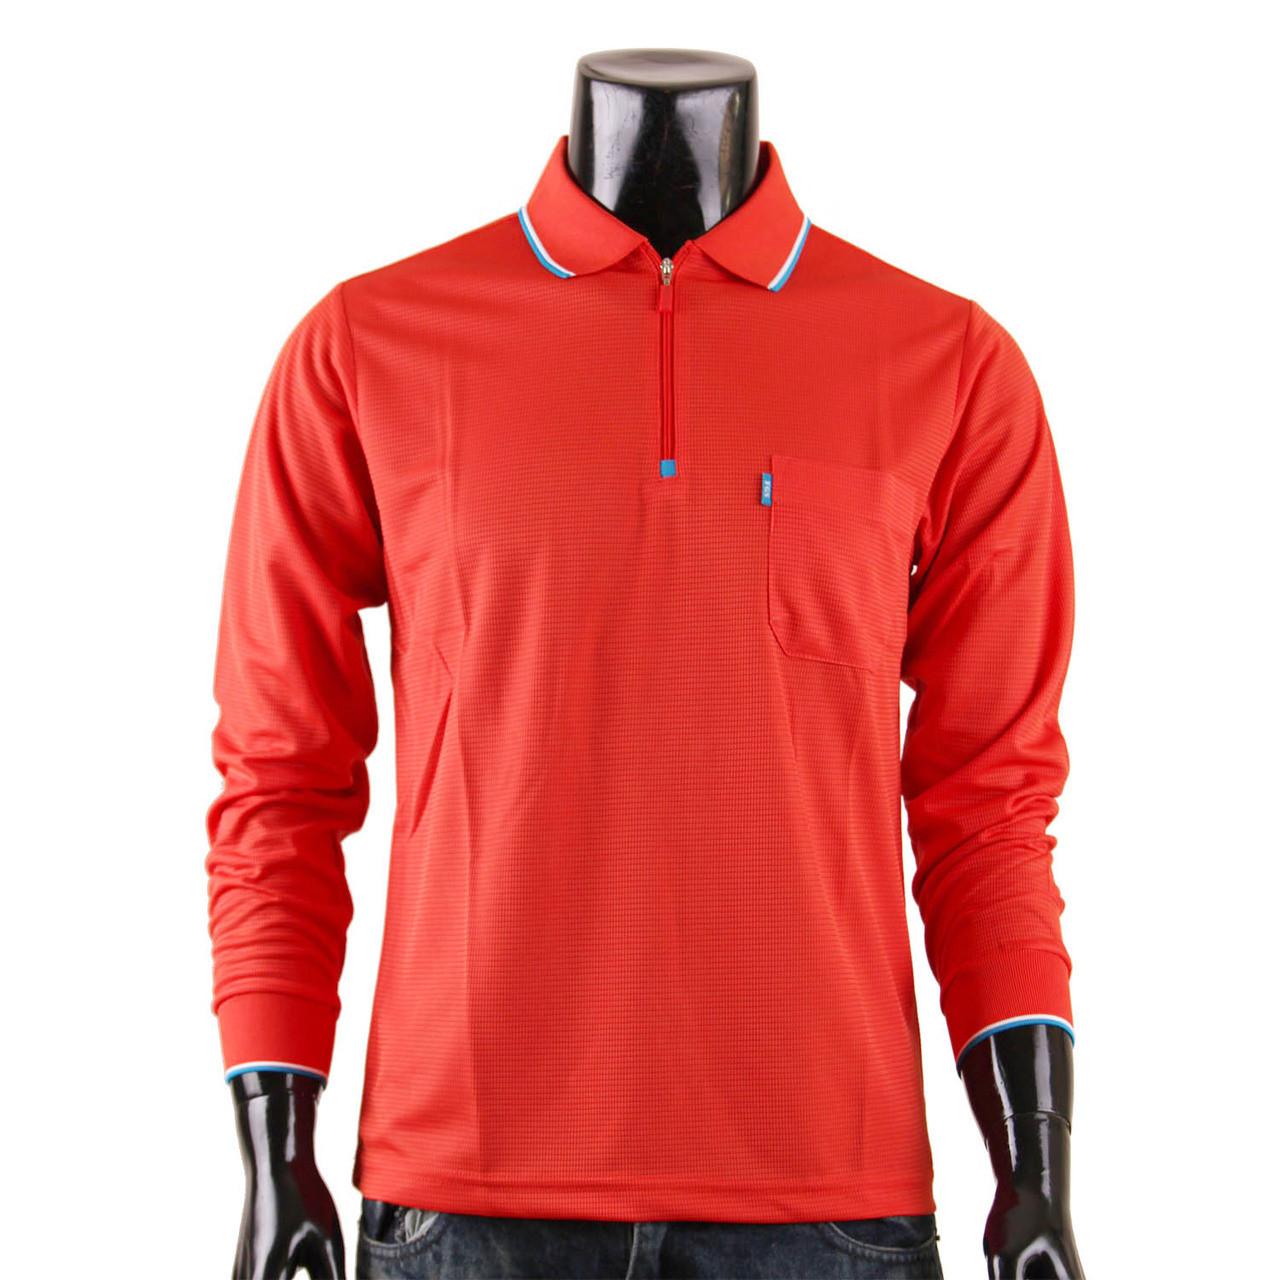 Mens Zip Polo Shirt Plain Zip Polo Shirt Long Sleeves Dri Fit